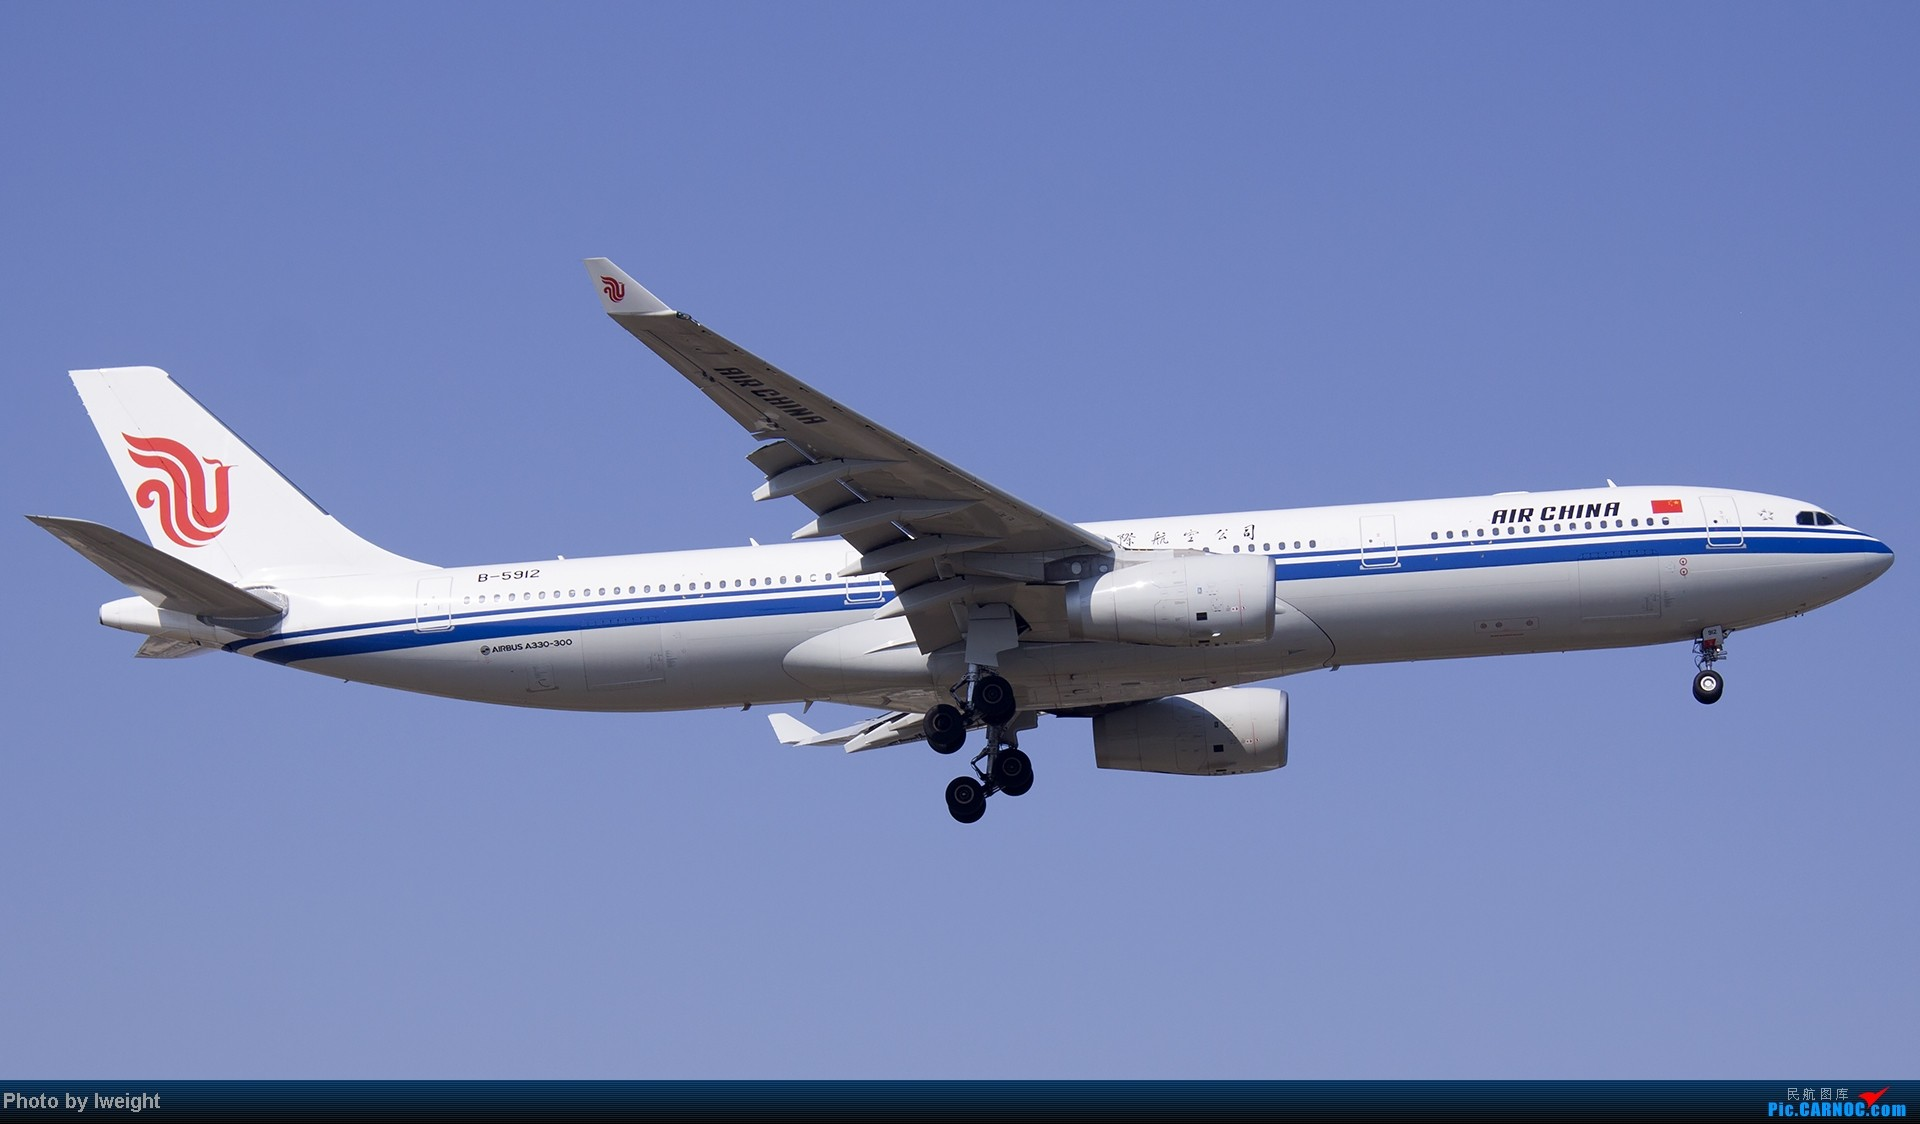 Re:[原创]北京难得的好天气,收获多种机型和彩绘,遗憾的是再次错过卡航巴塞罗那彩绘 AIRBUS A330-300 B-5912 中国北京首都机场